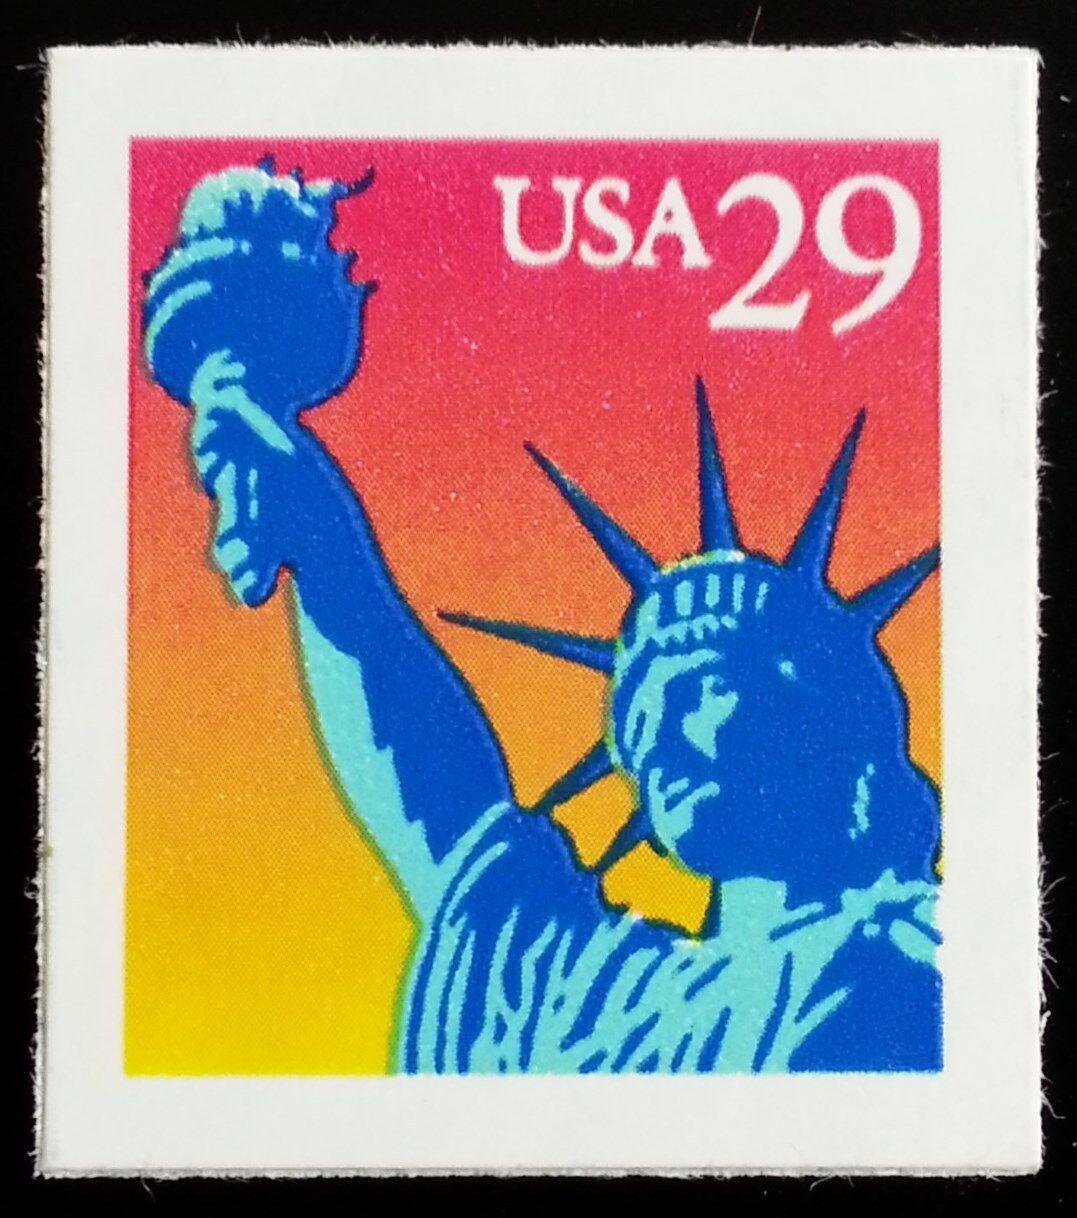 1994 29c Statue of Liberty, Self-Adhesive Issue Scott 2